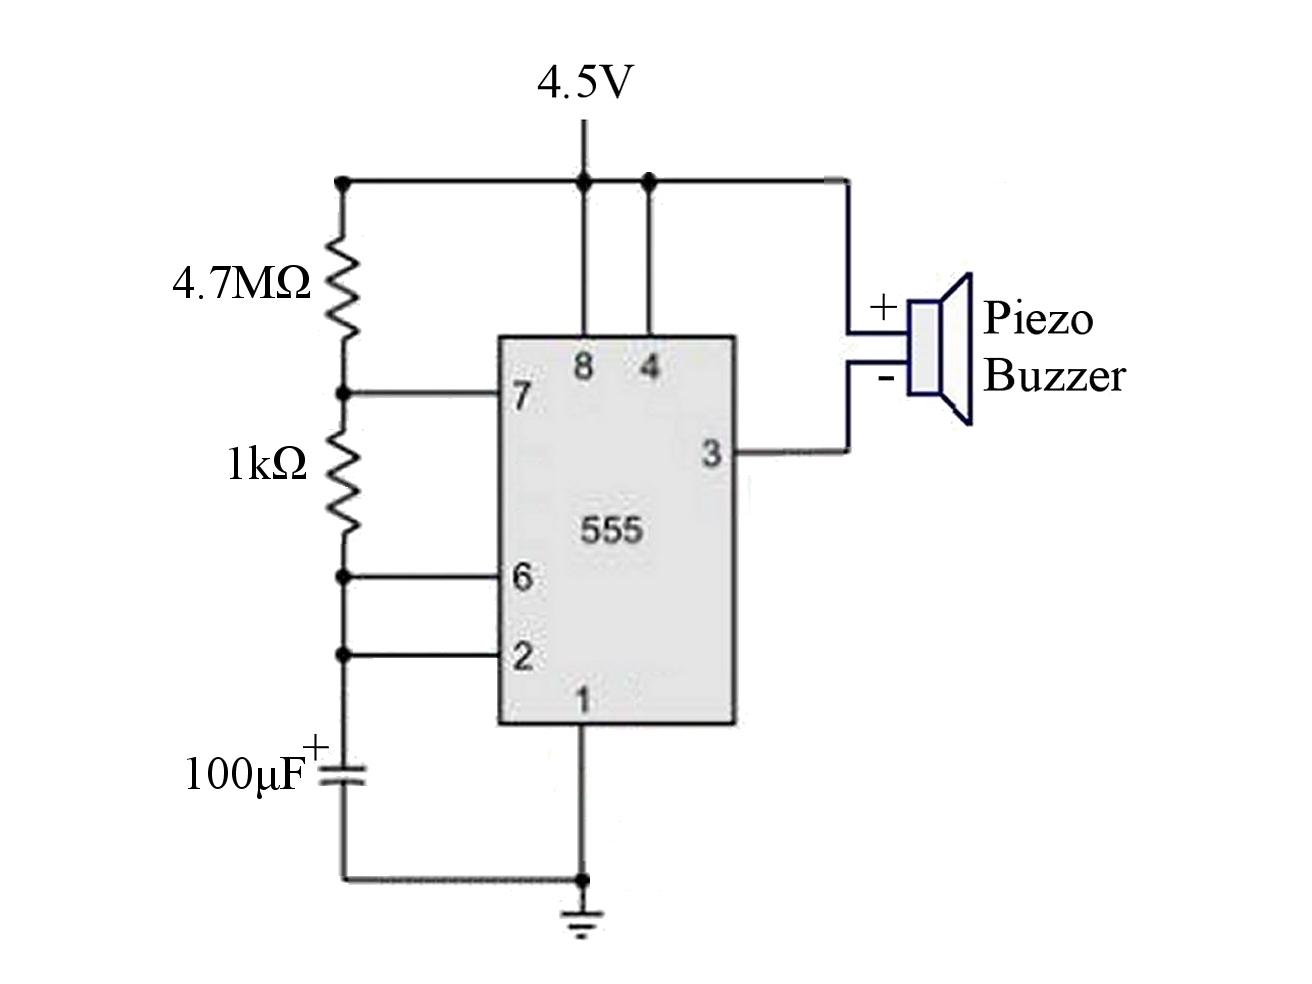 wiring diagram ibanez jem 555 ibanez rg550 wiring diagram